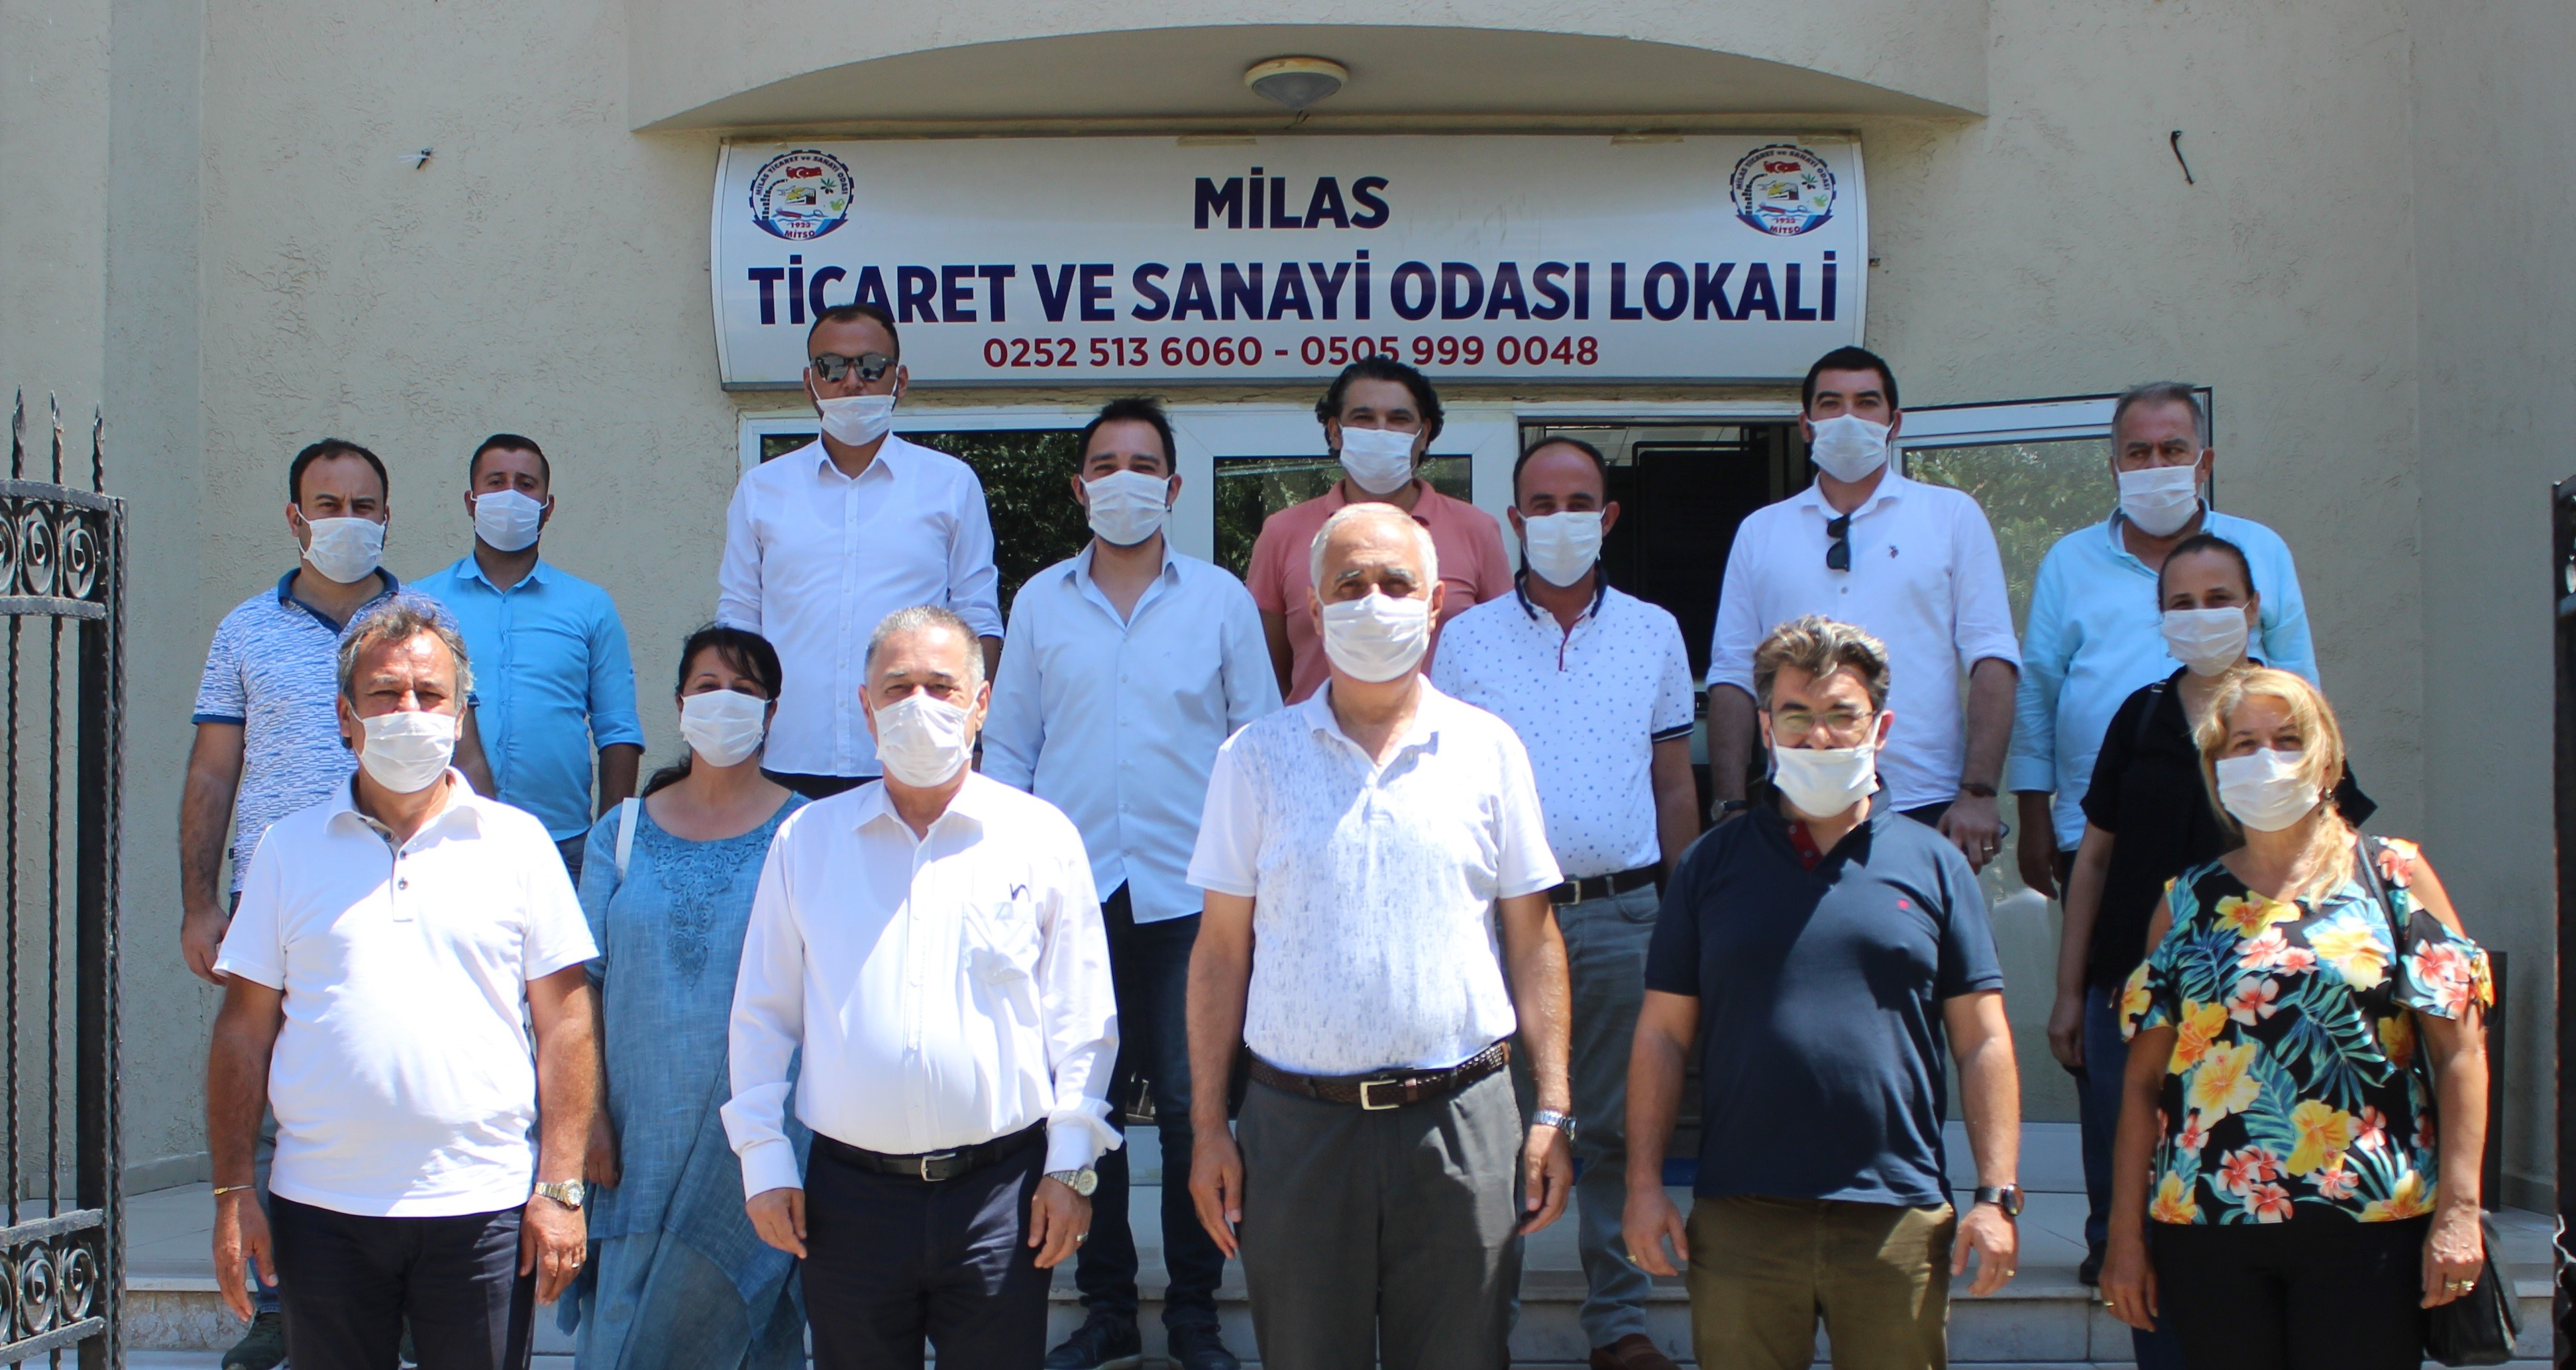 CHP MİTSO'DA…  MUĞLA'NIN VE MİLAS'IN BİR MASTIR PLANI OLMALI